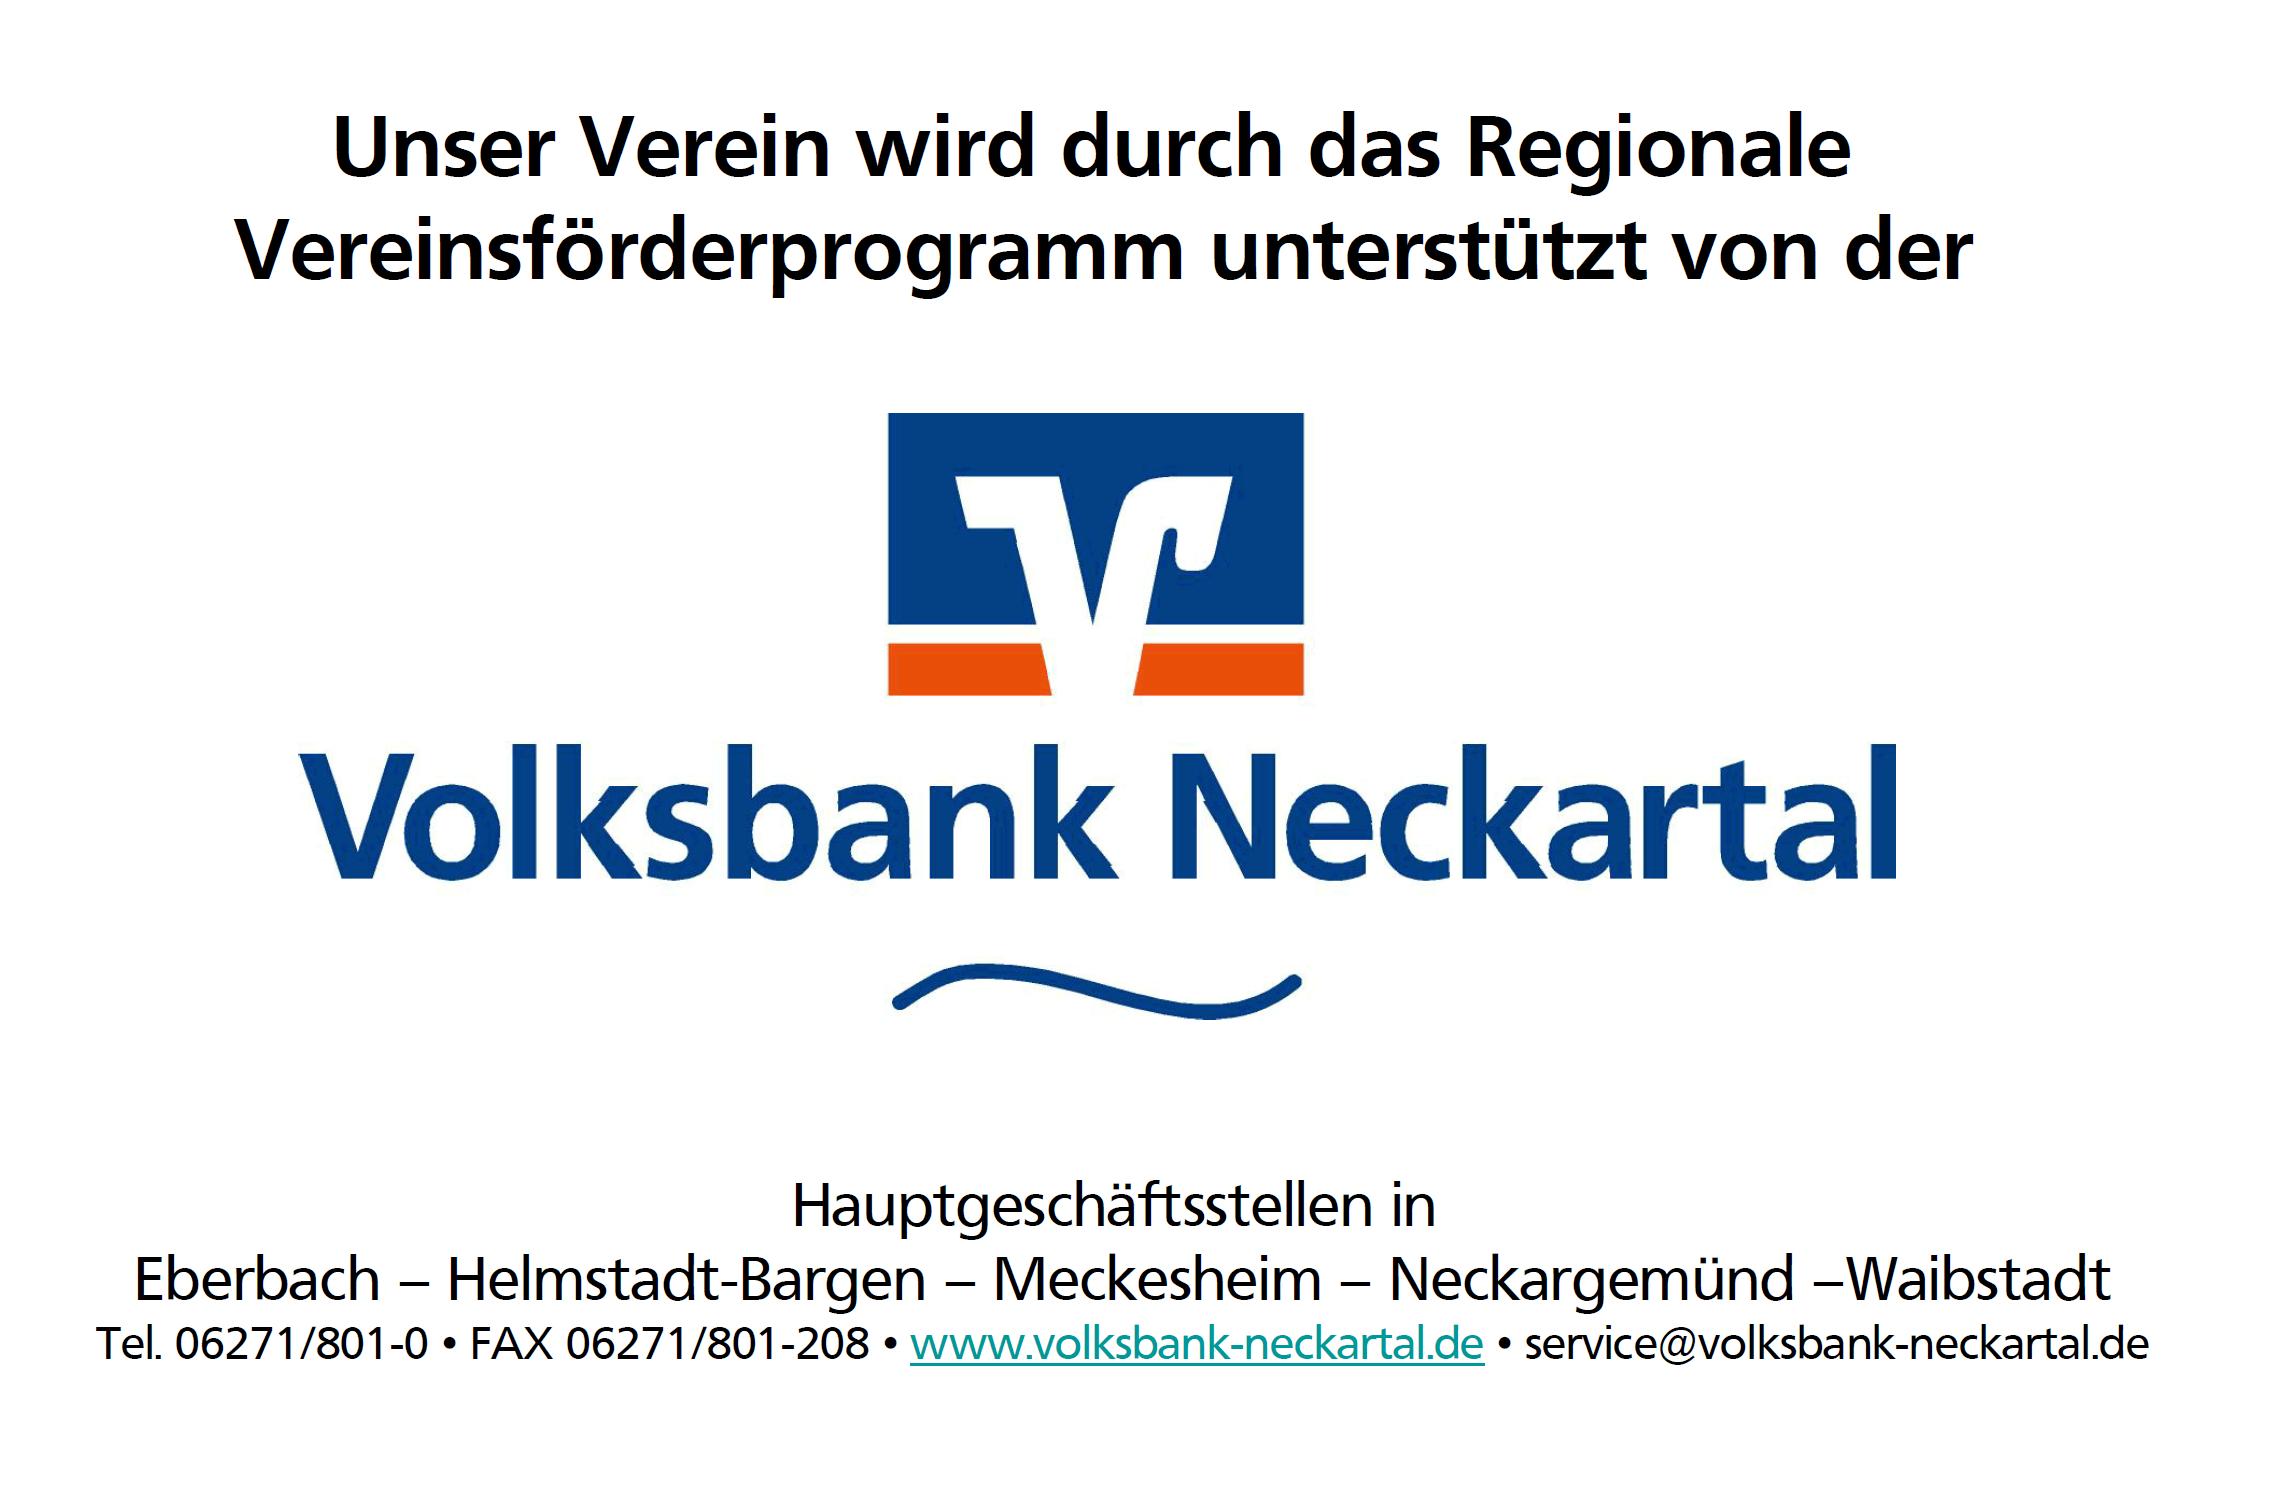 Volksbank Neckartal